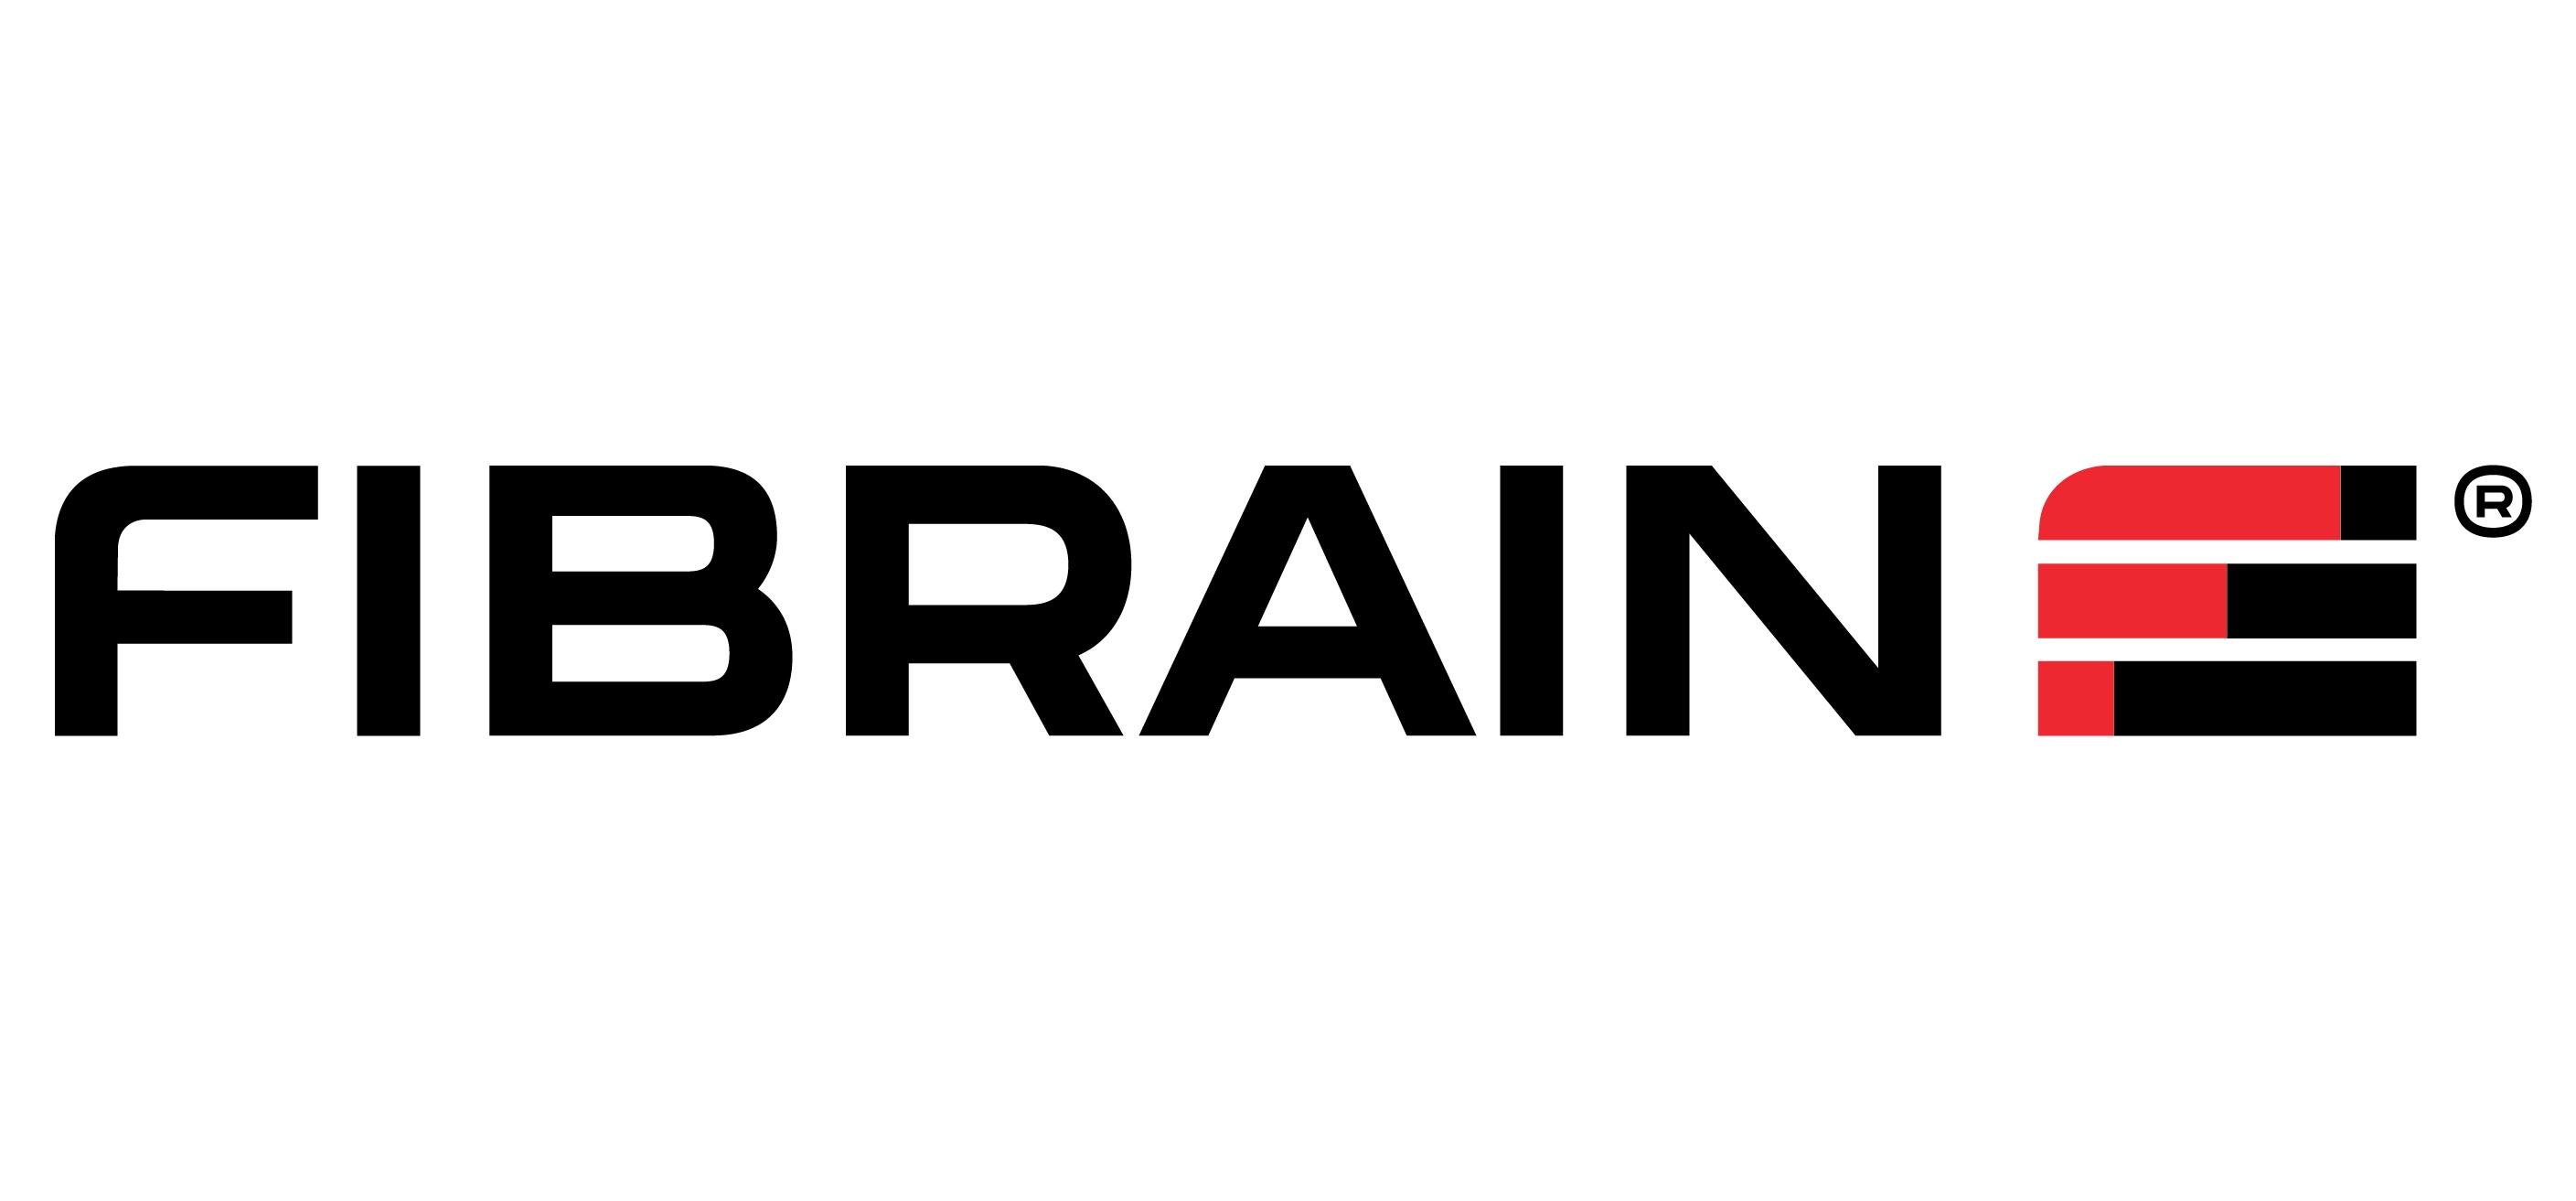 podstawowe FIBRAIN2